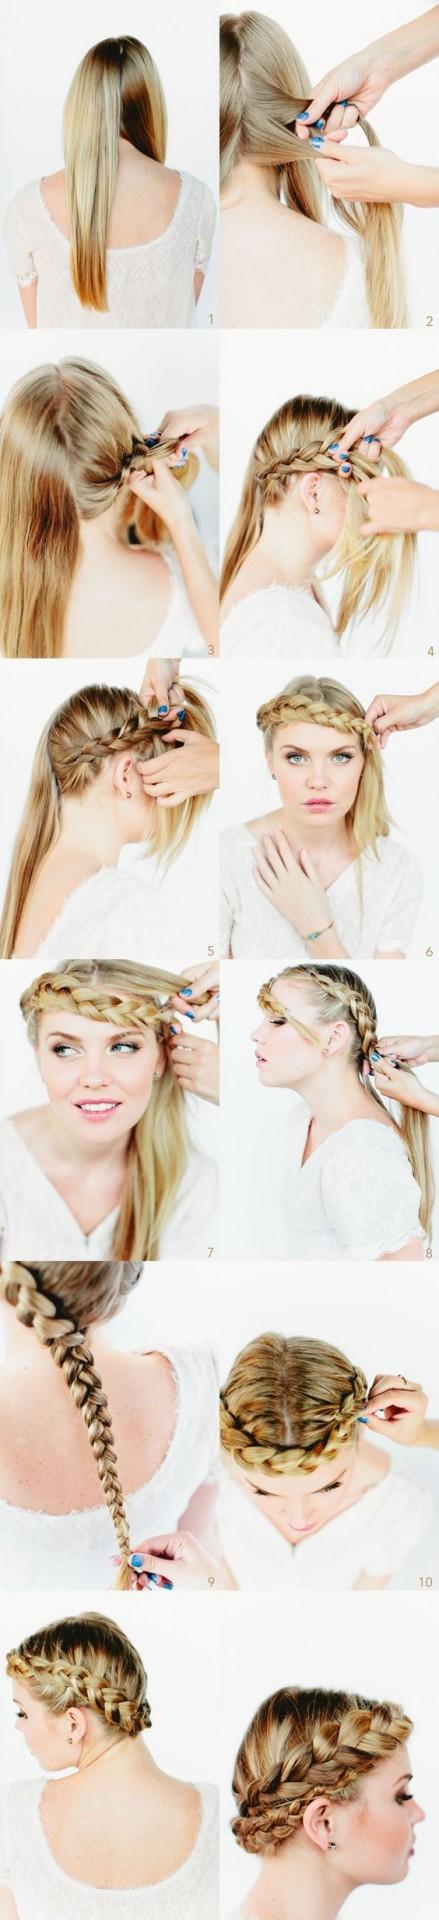 tutorial peinado corona trenza invitada